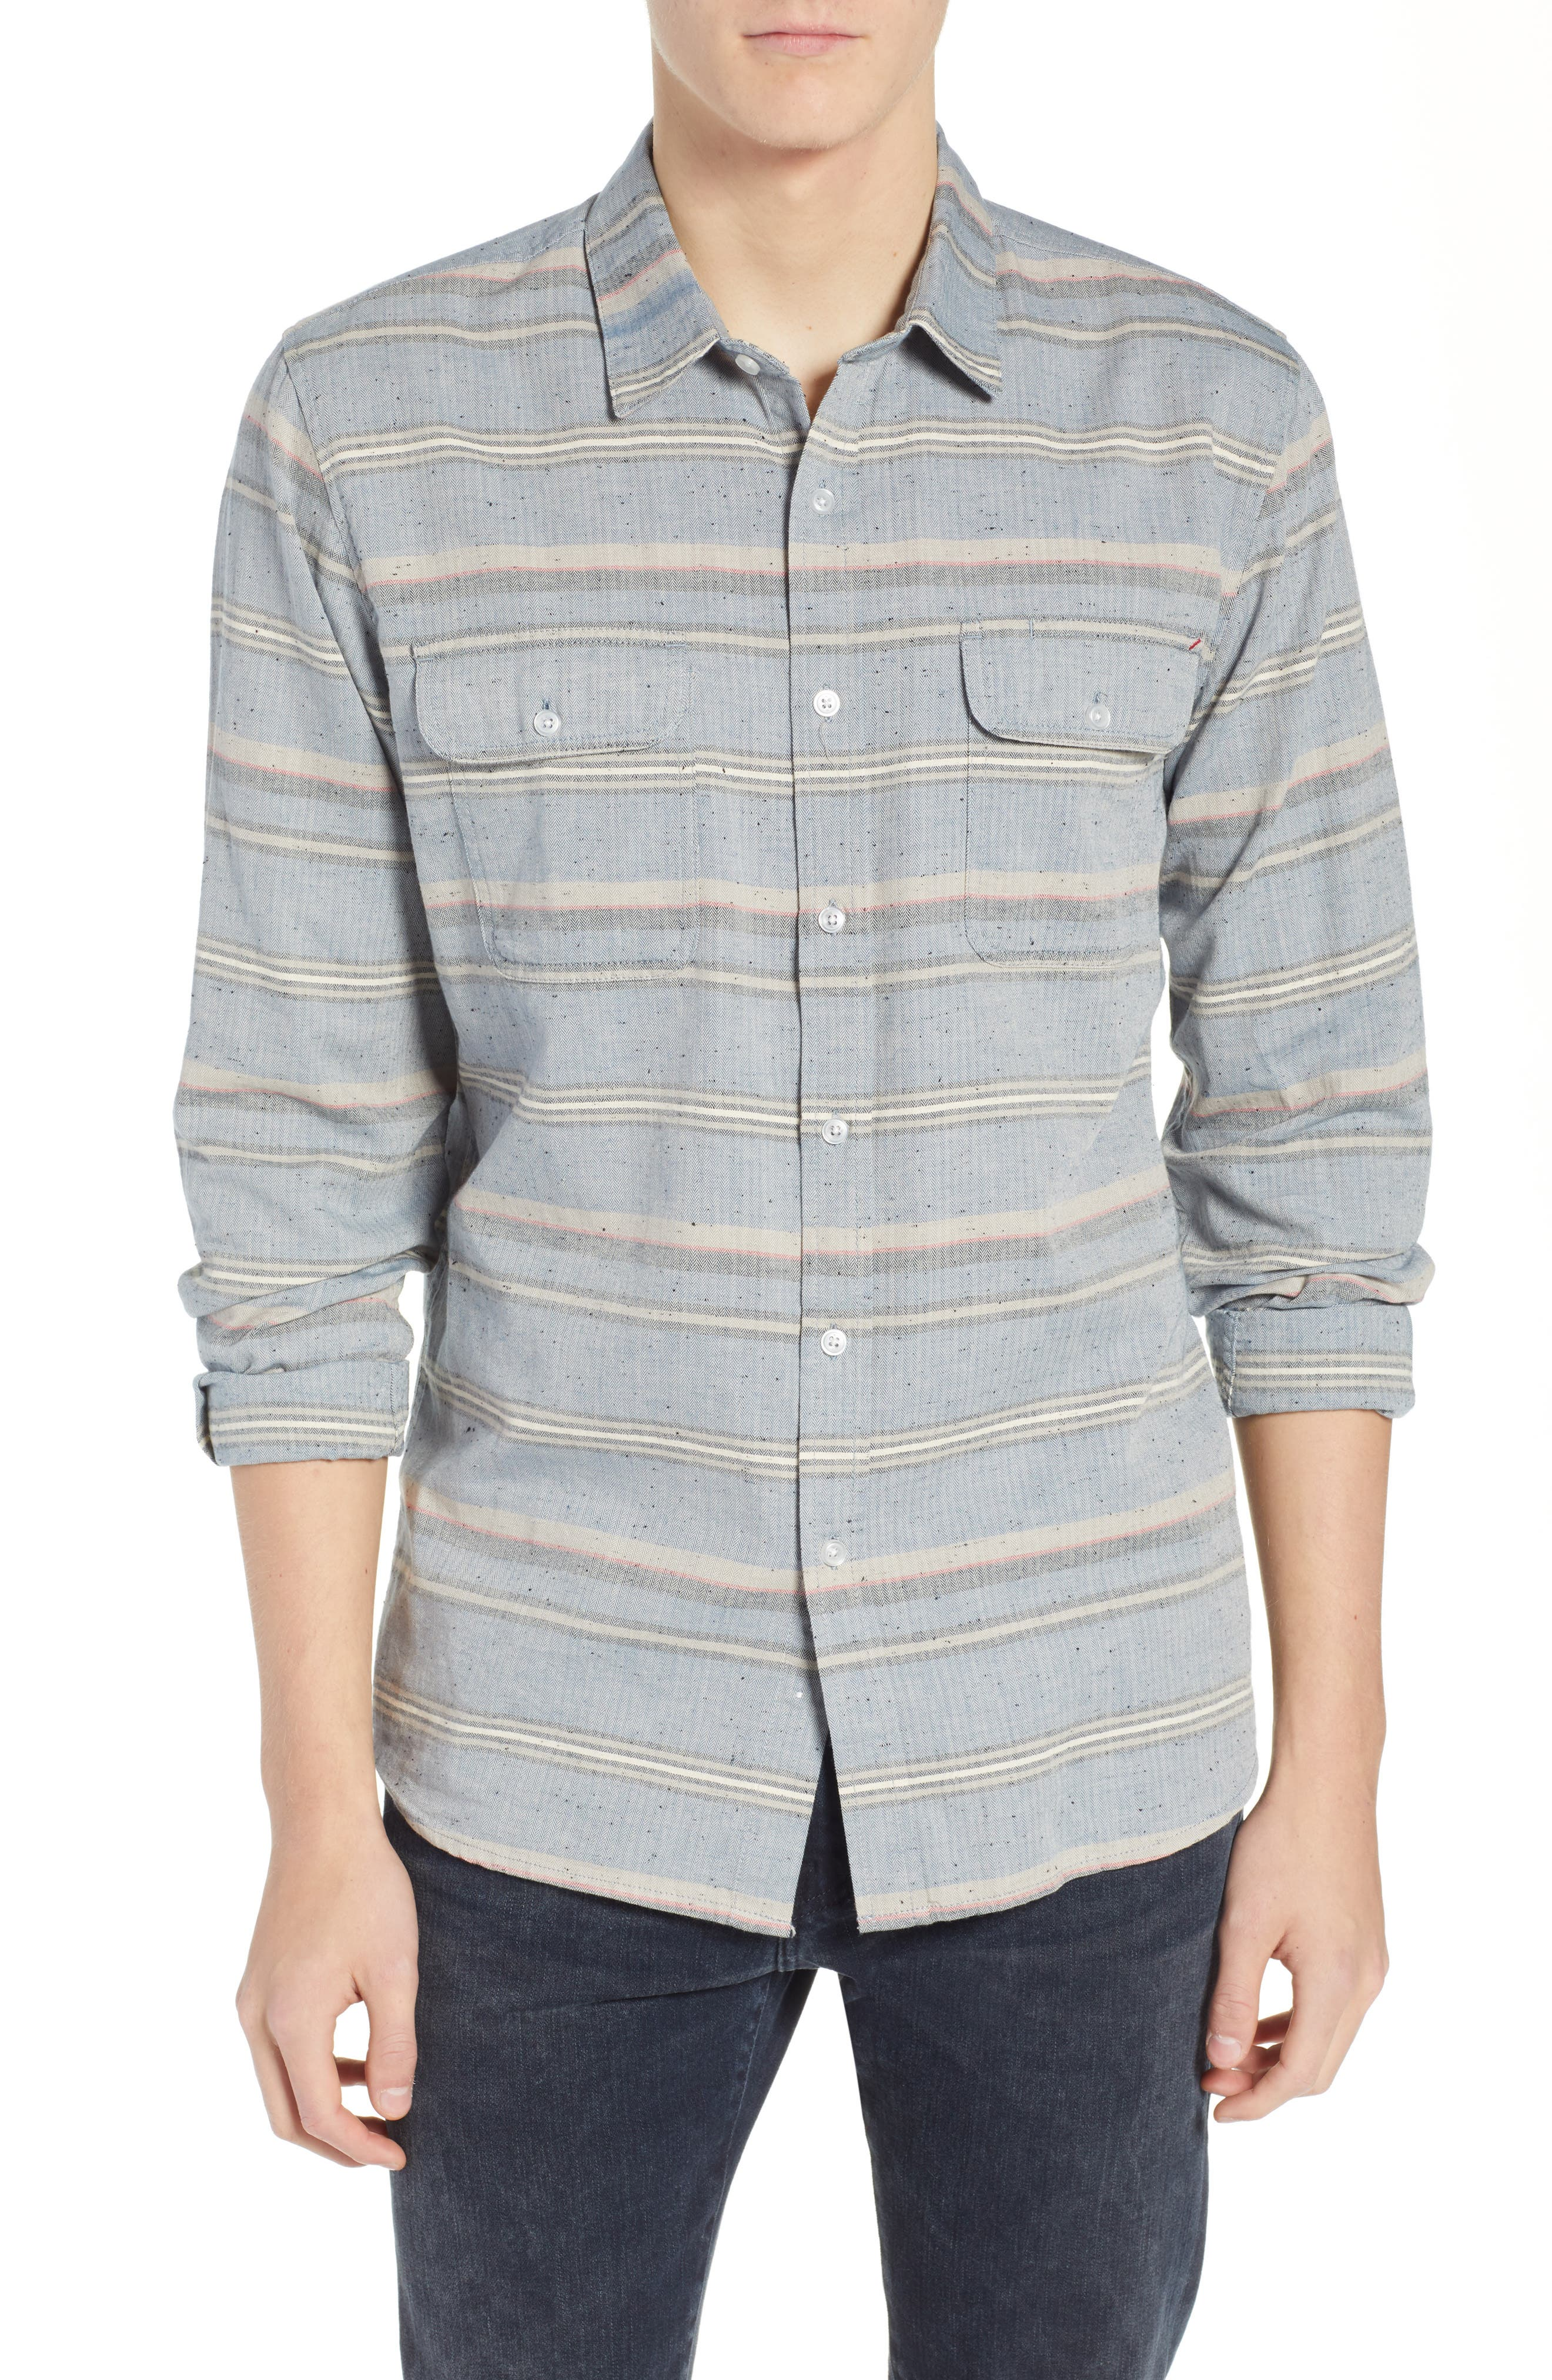 Logan Flannel Shirt,                             Main thumbnail 1, color,                             BLUE